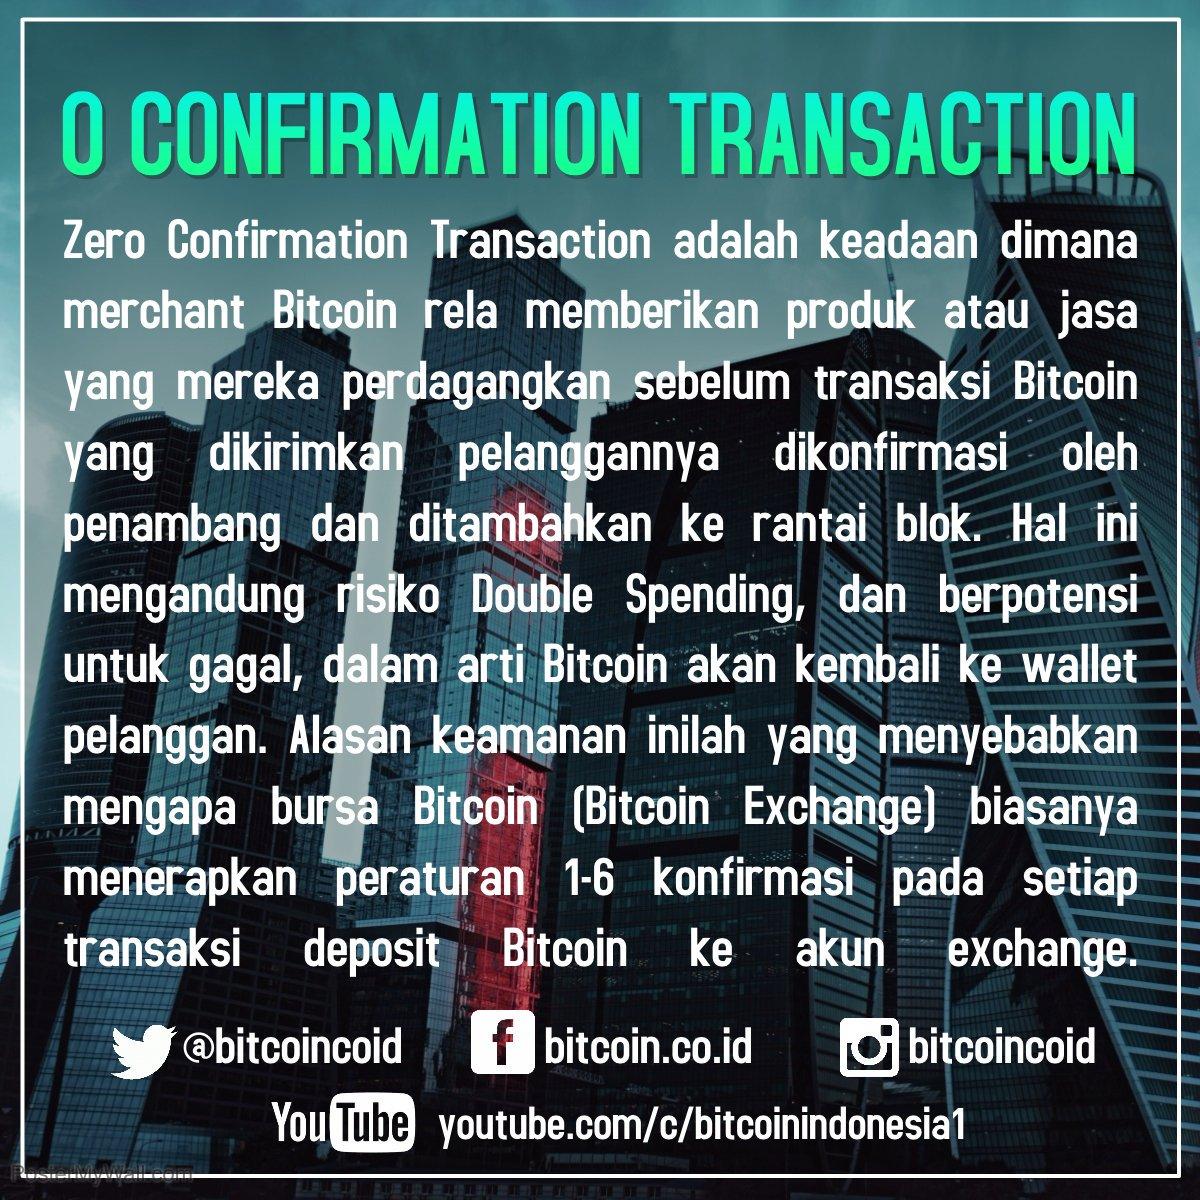 Zero-confirmation transaction